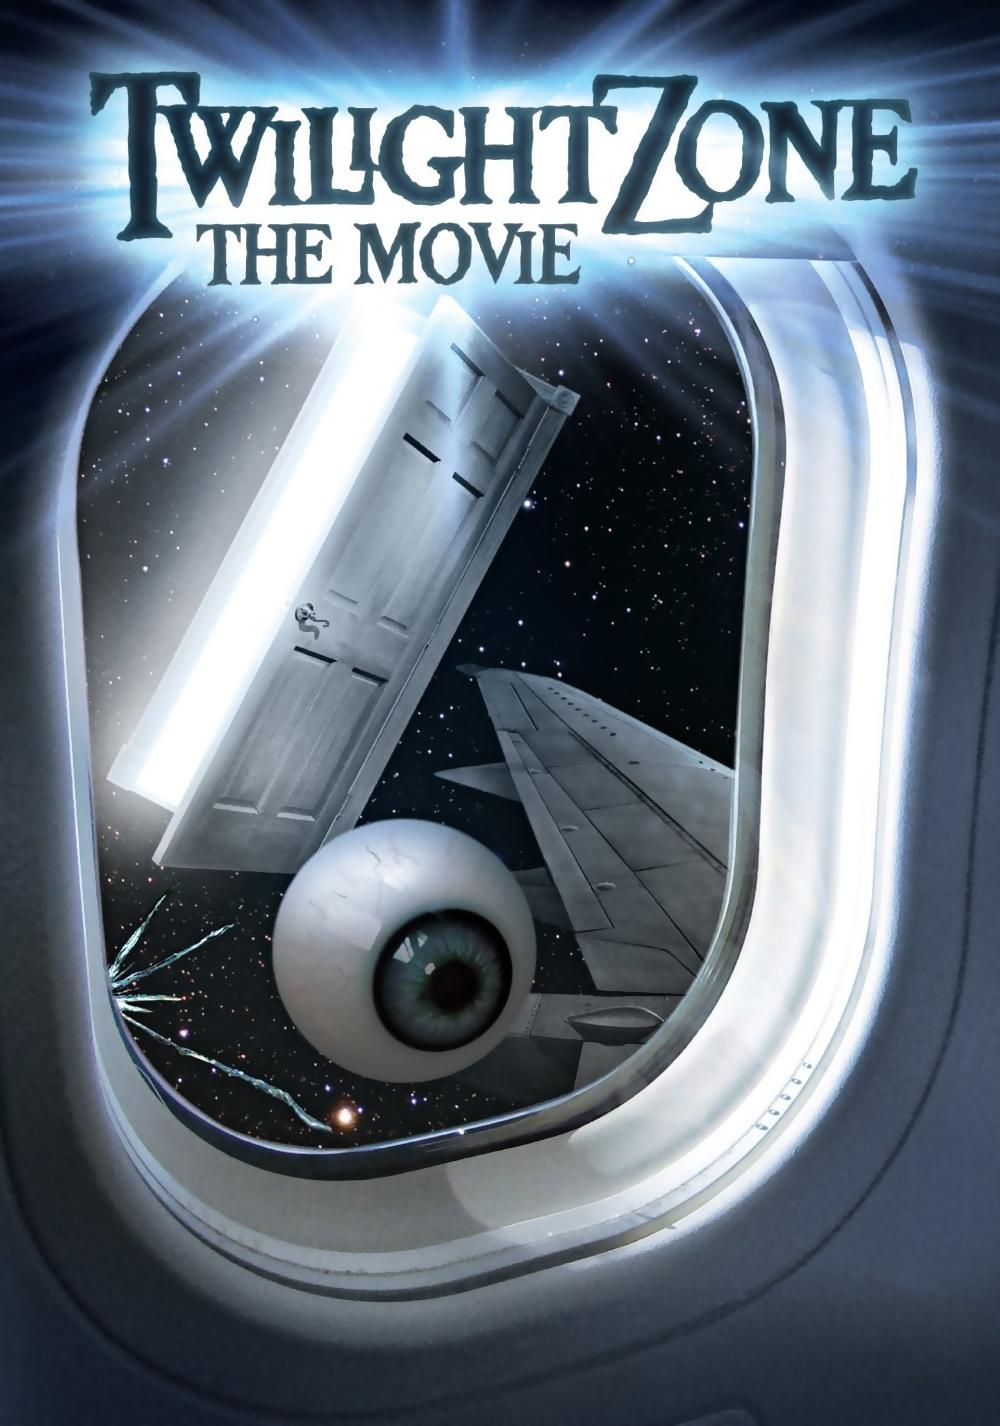 twilight-zone-the-movie-521e40f0b3b5c[1].jpg